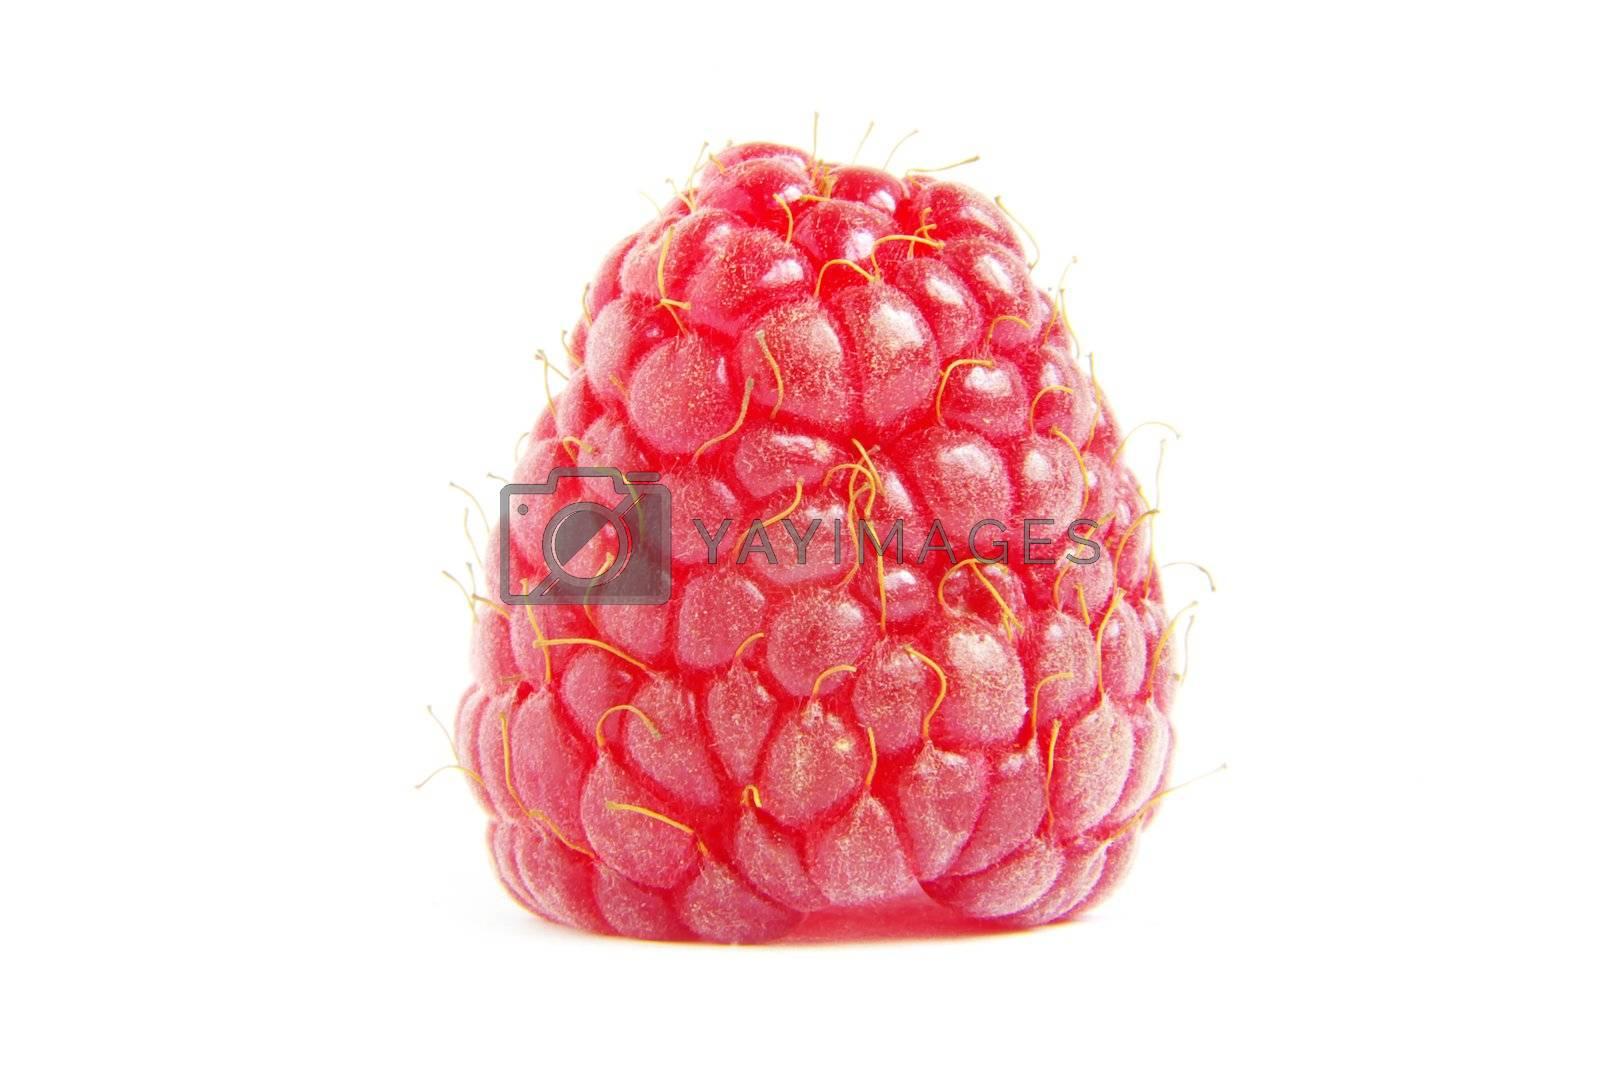 Ripe raspberry on a white background